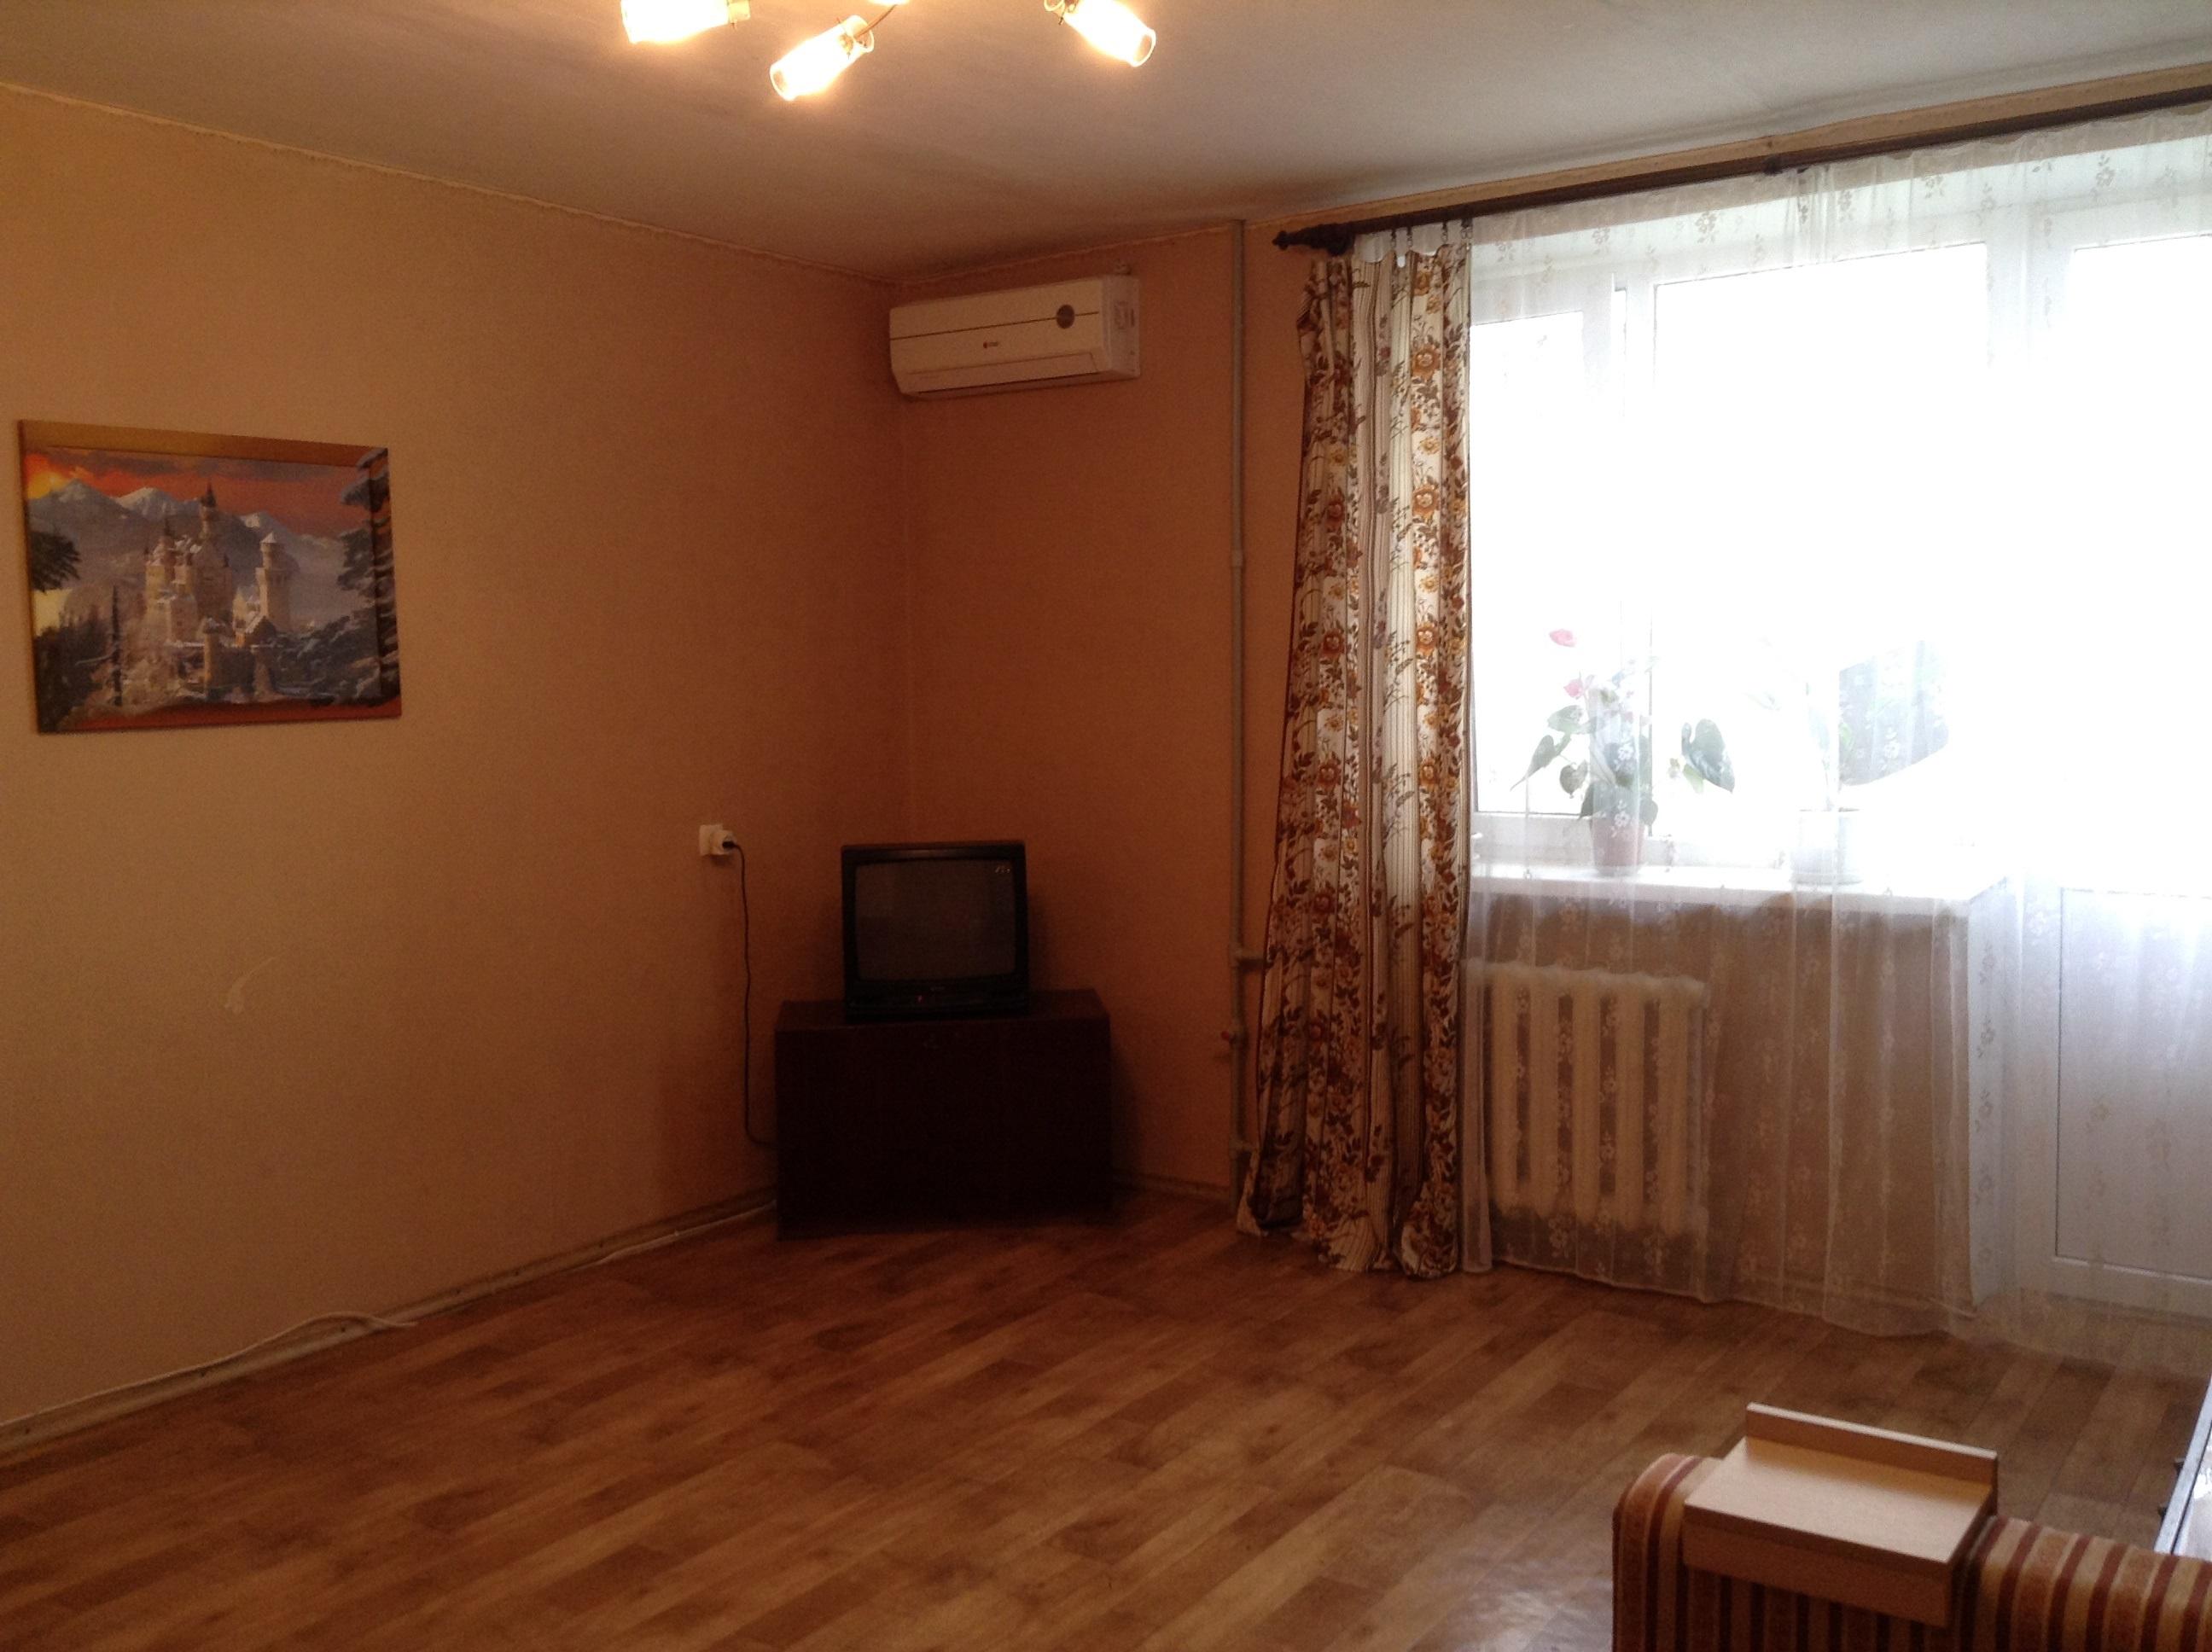 Отдых в Беларуси.1 комнатная квартира в Евпатории в районе гостиницы Украина.Беларусь.